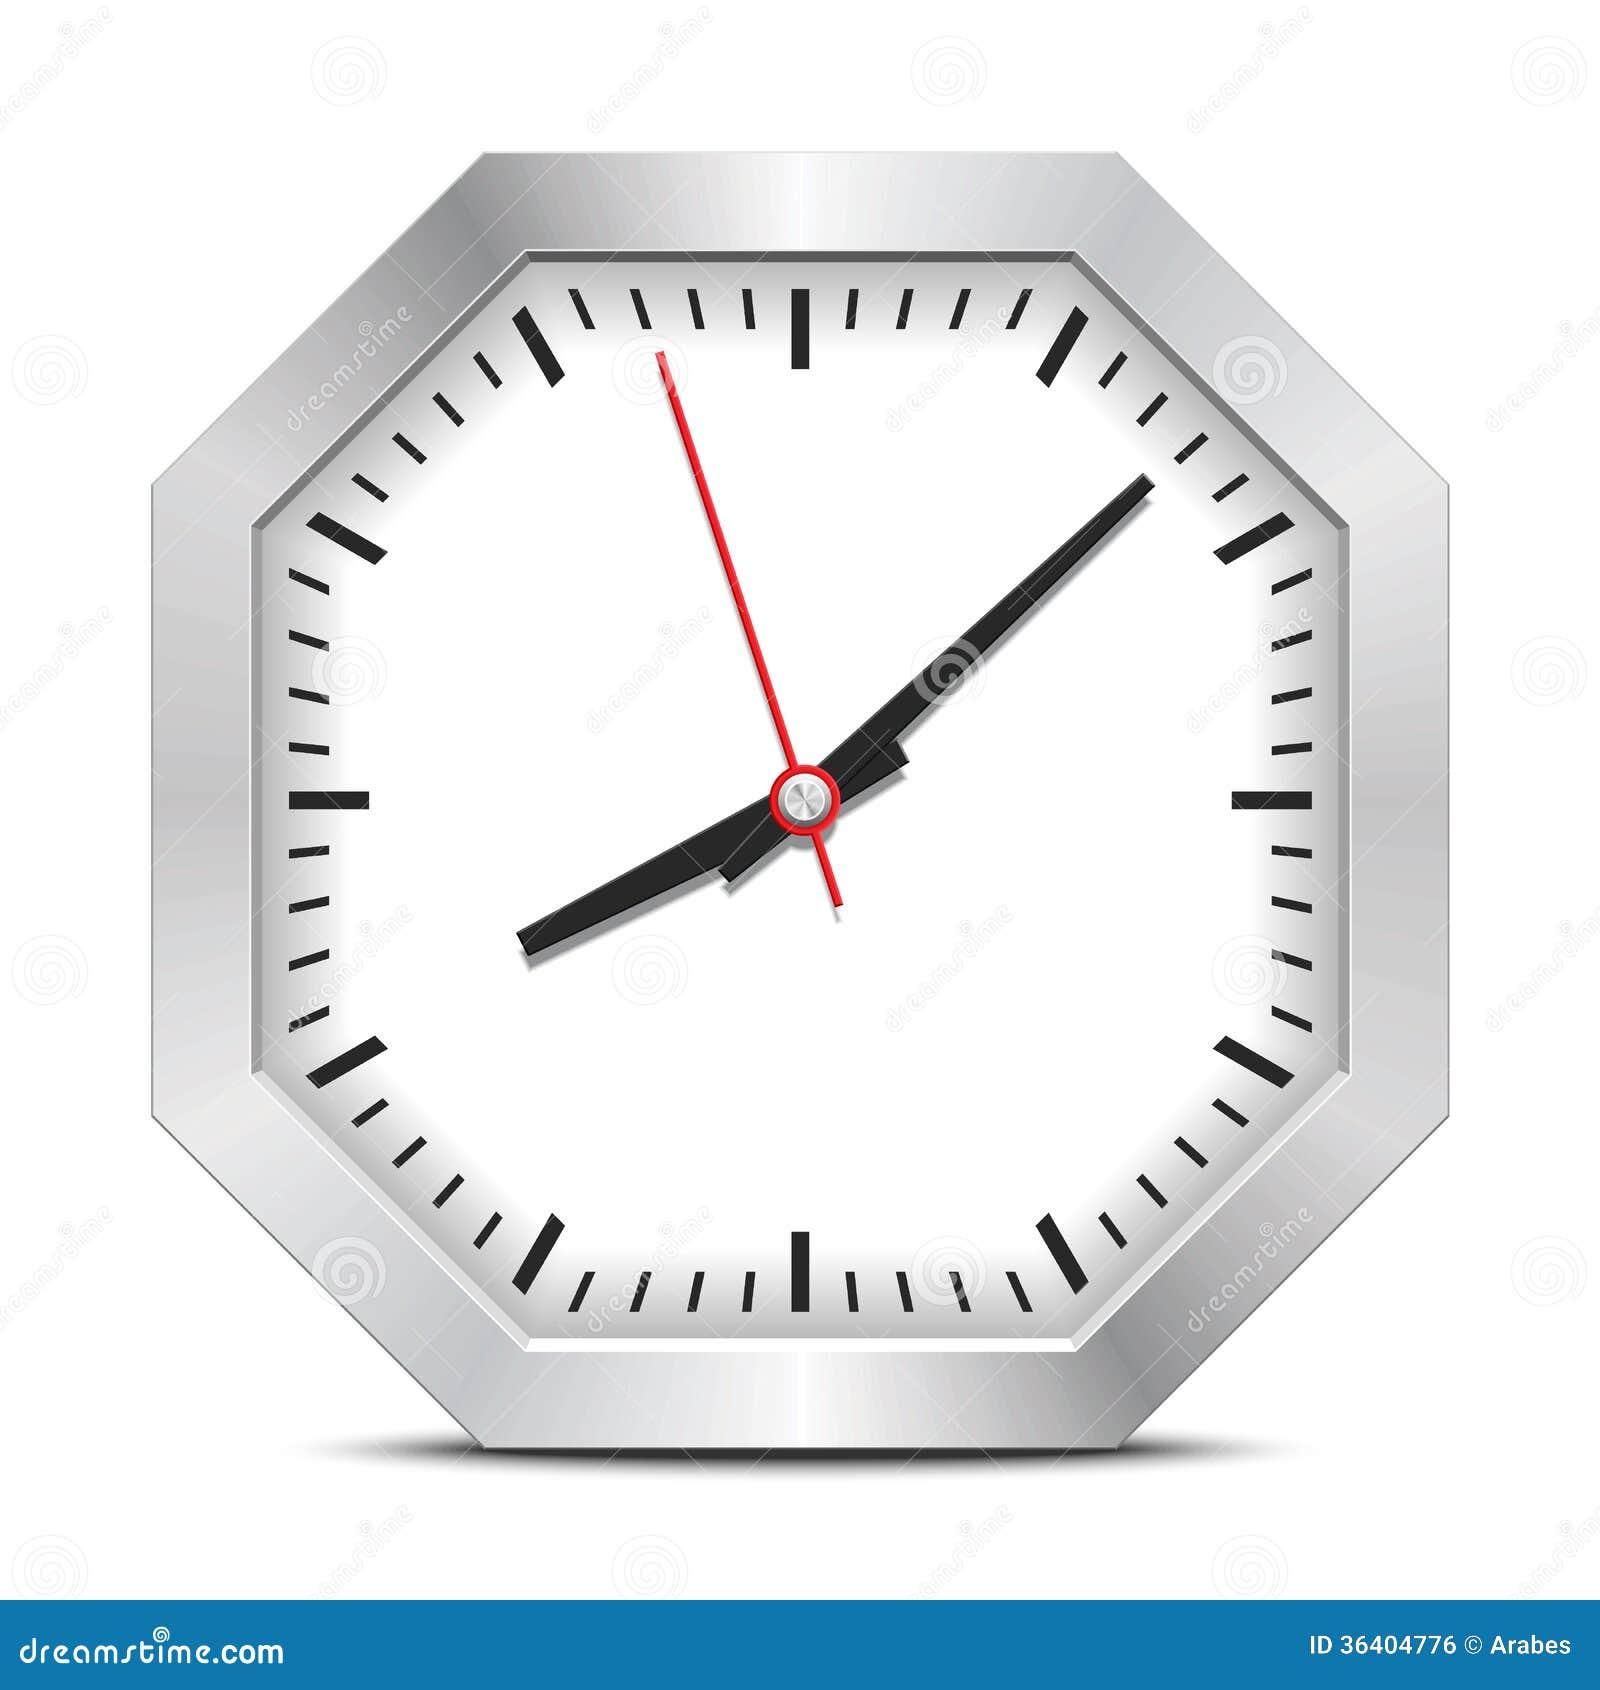 Octagon Clock Royalty Free Stock Image - Image: 36404776